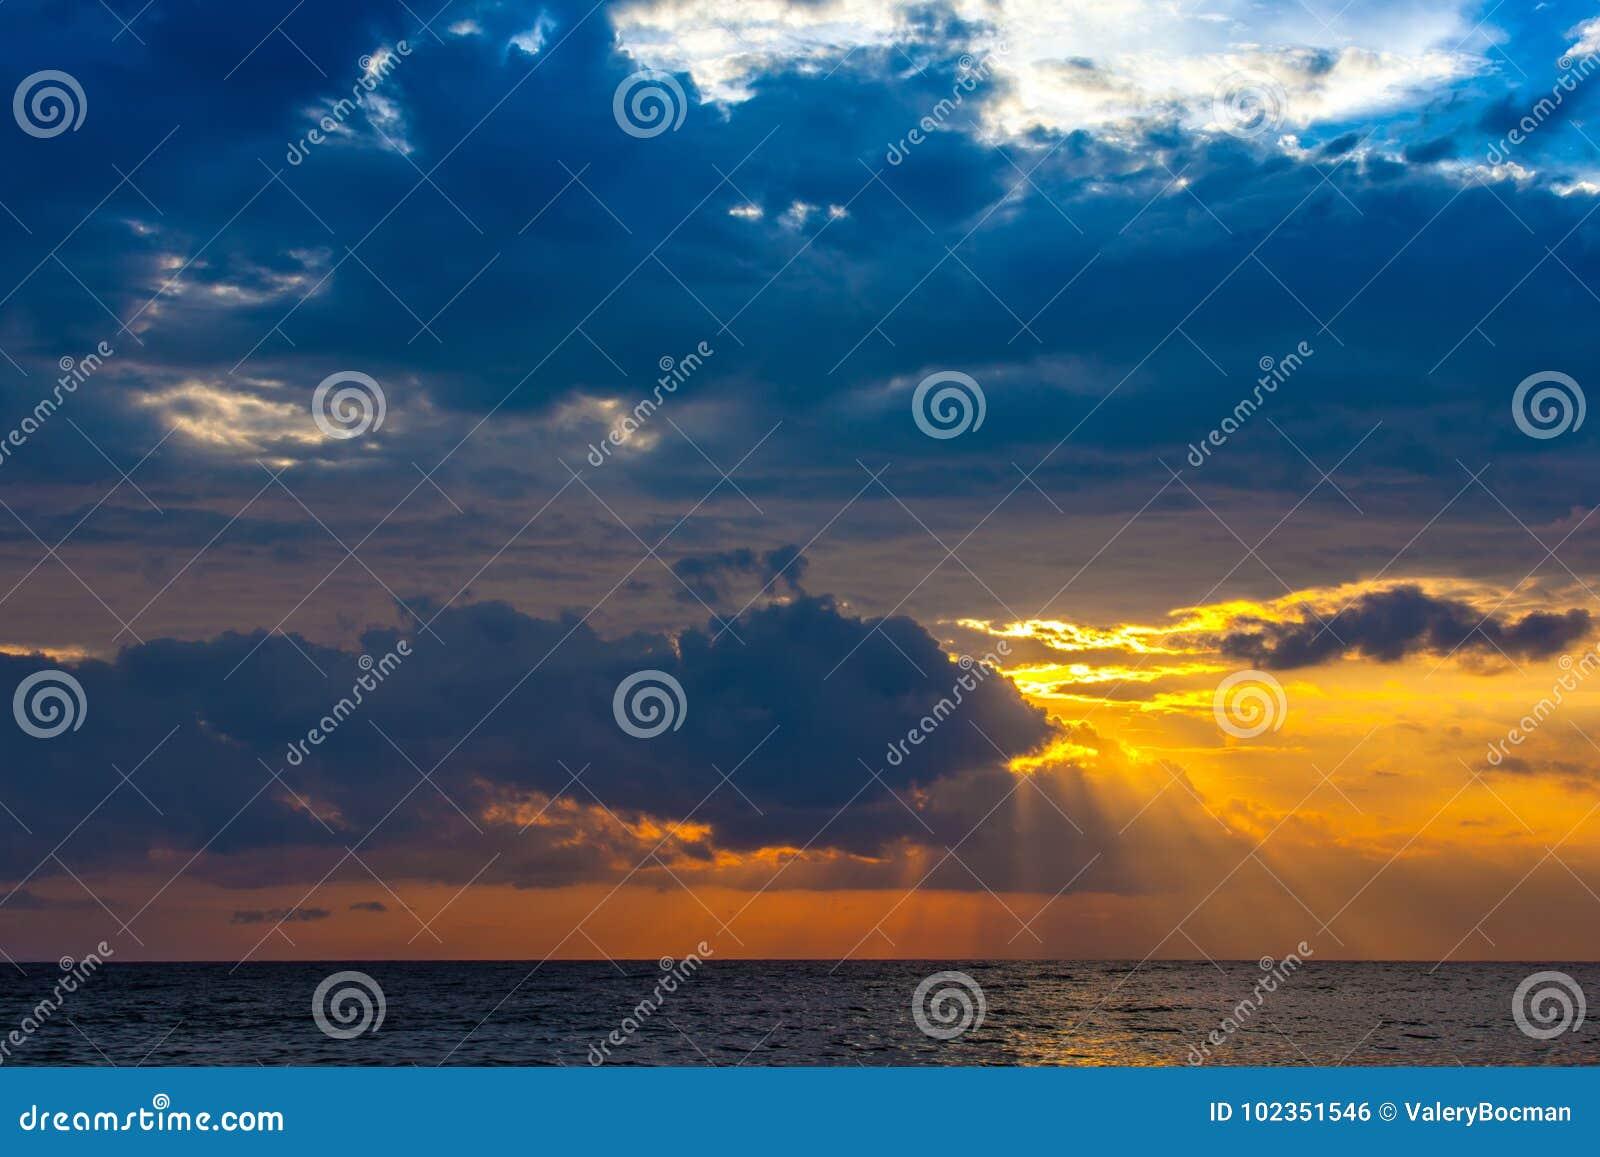 Sunset on the Lombok island, Indonesia.